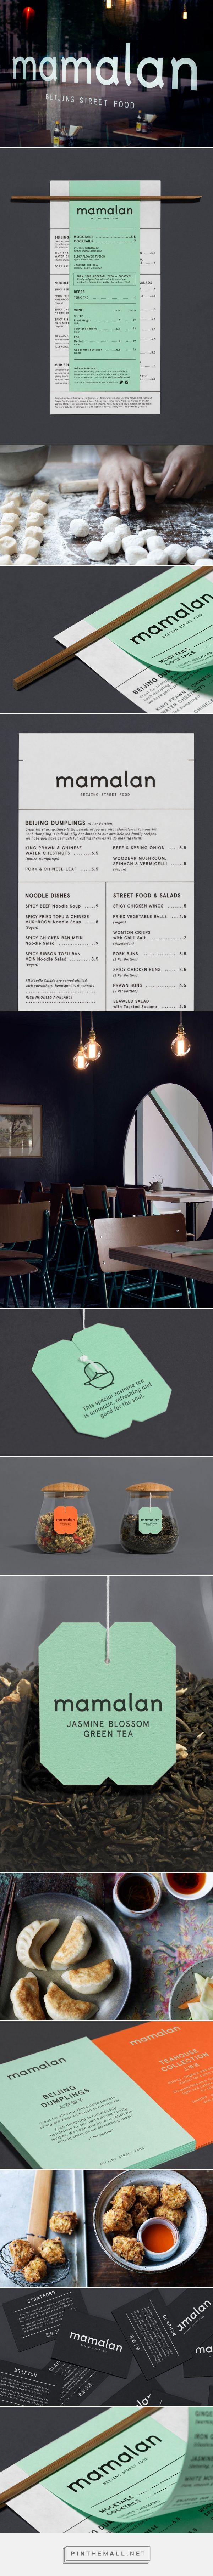 Mamalan Beijing Street Food Restaurant Branding and Menu Design by Midday | Fivestar Branding Agency – Design and Branding Agency & Curated Inspiration Gallery